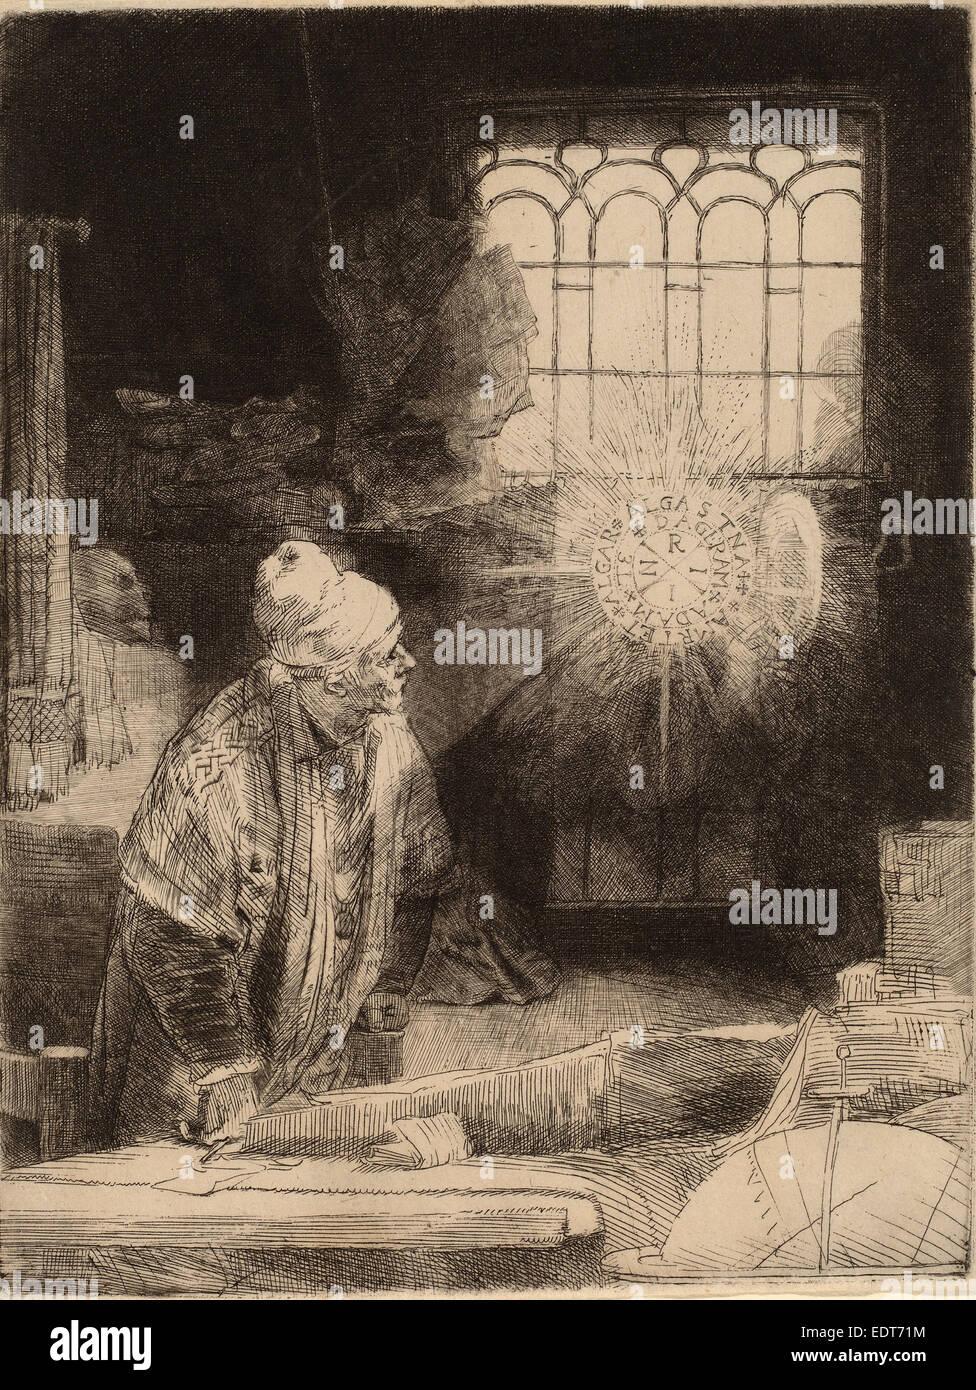 Rembrandt van Rijn (Dutch, 1606 - 1669), Faust, c. 1652, etching, drypoint and burin - Stock Image